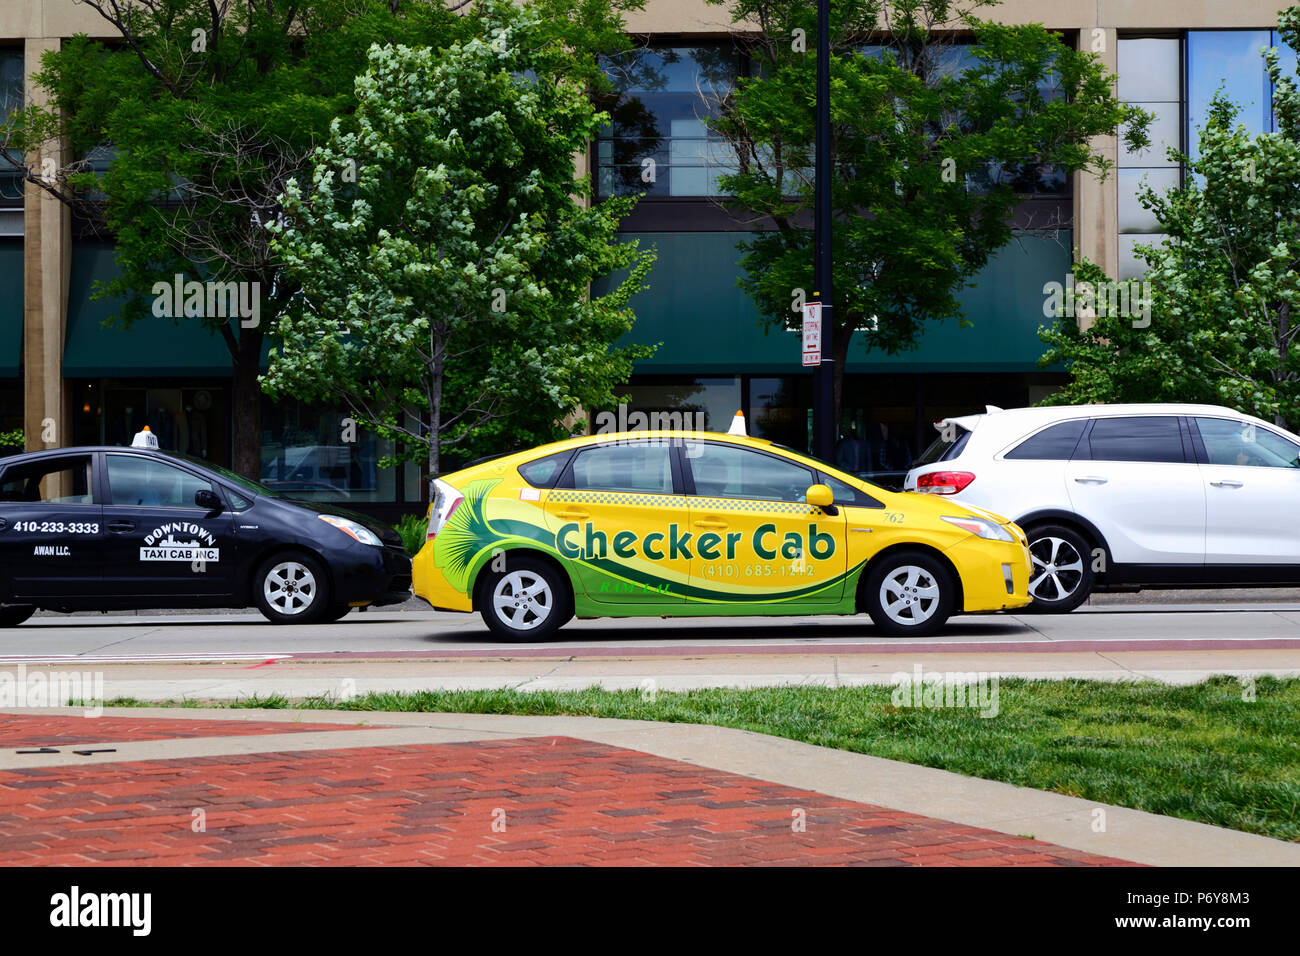 Checker cab taxi near Harborplace, Baltimore, Maryland, USA Stock Photo